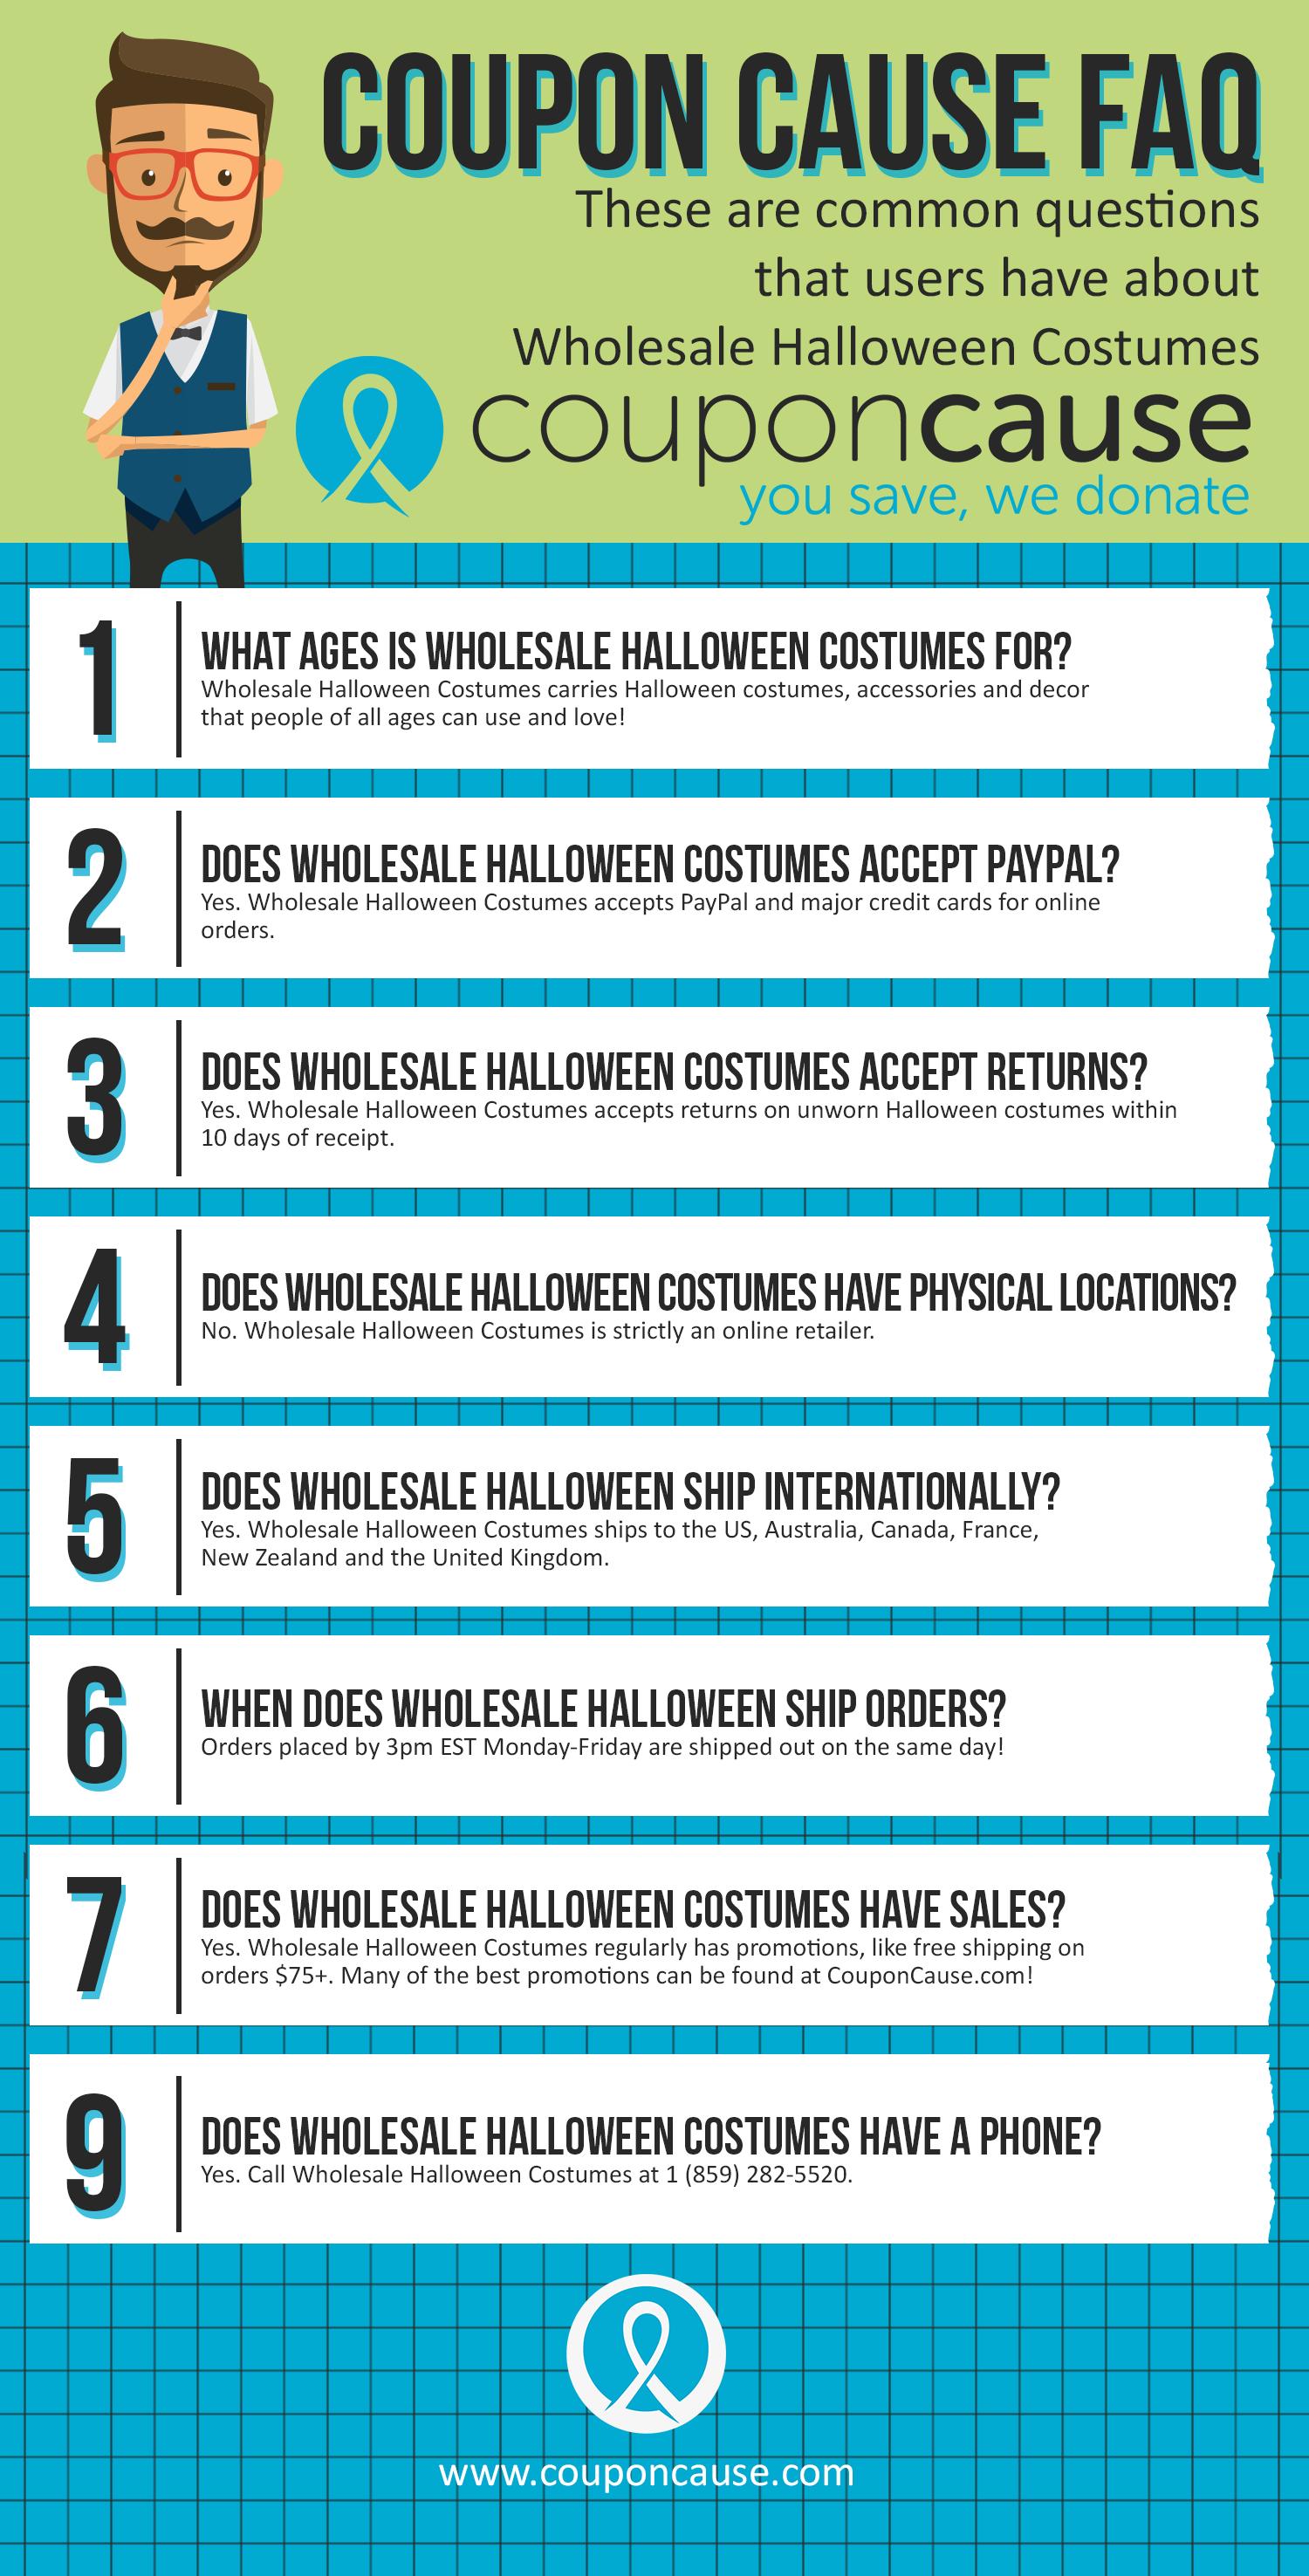 Wholesale Halloween Costumes Coupon Cause FAQ (C.C. FAQ)